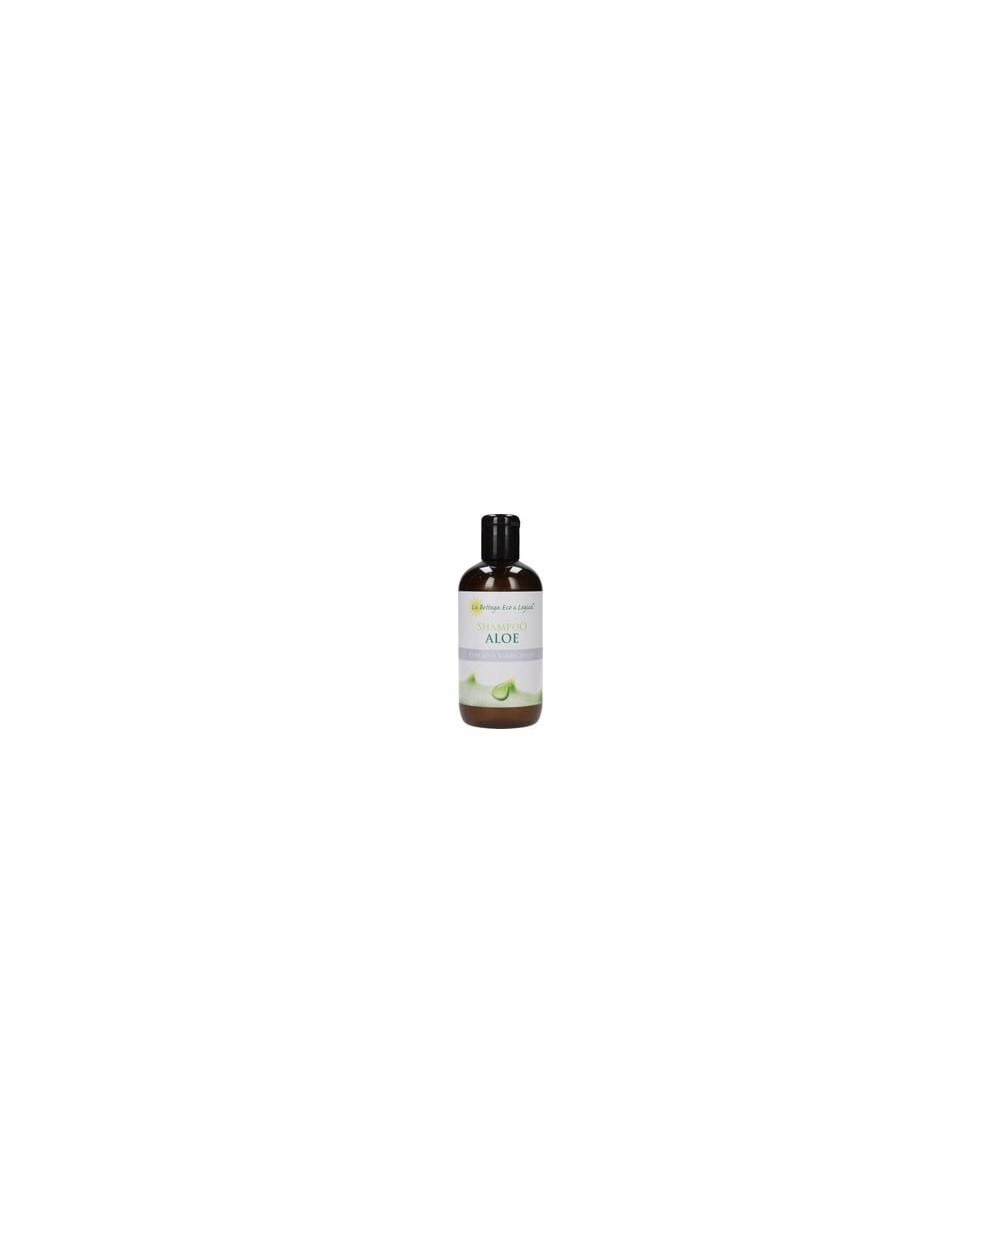 La Bottega Eco & Logica - Shampoo Aloe